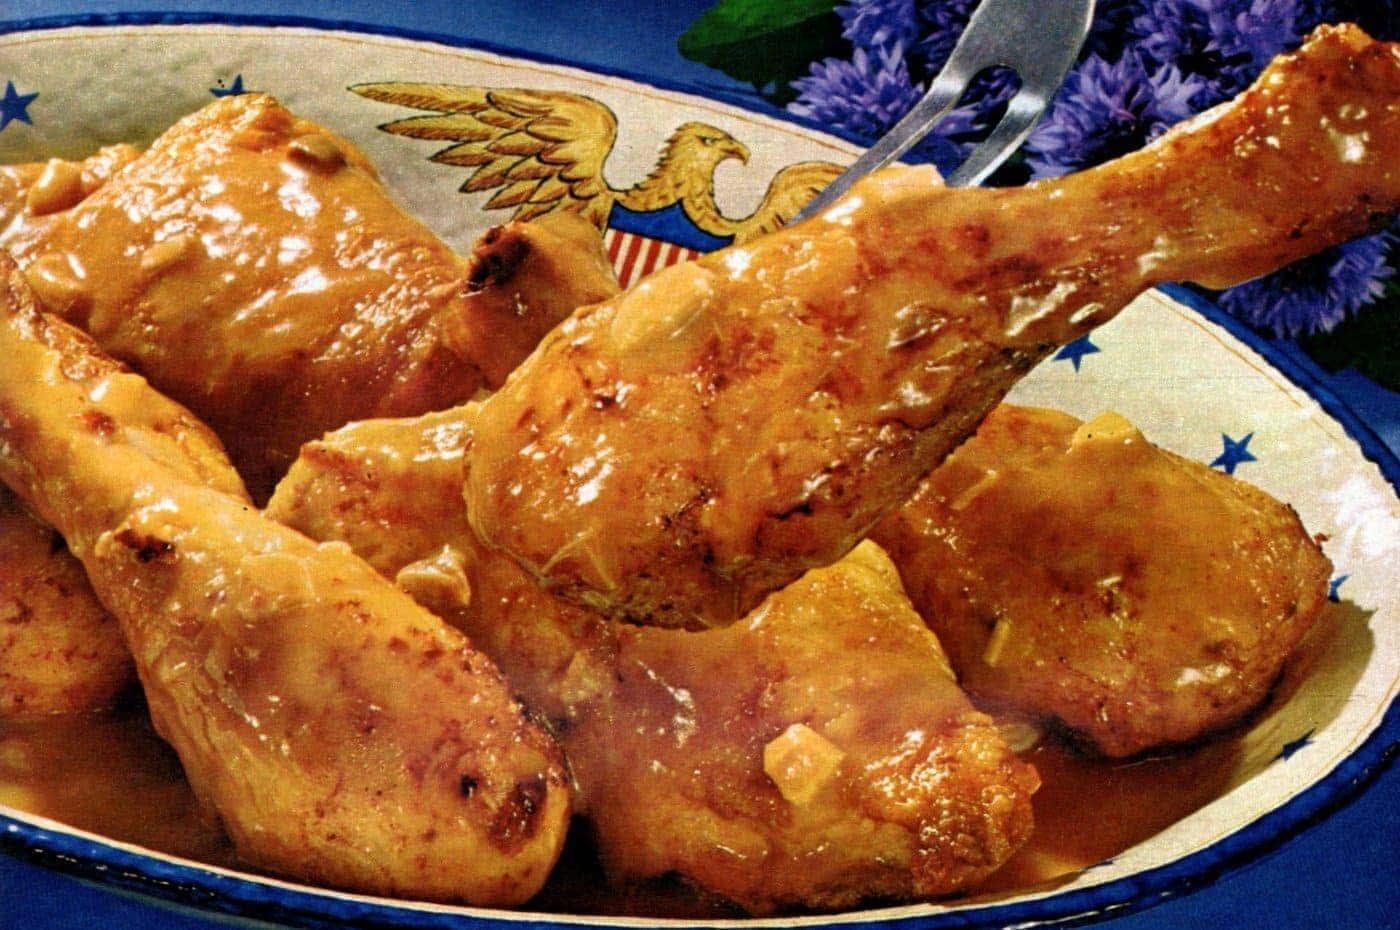 Glori-fried chicken with gravy recipe (1967)